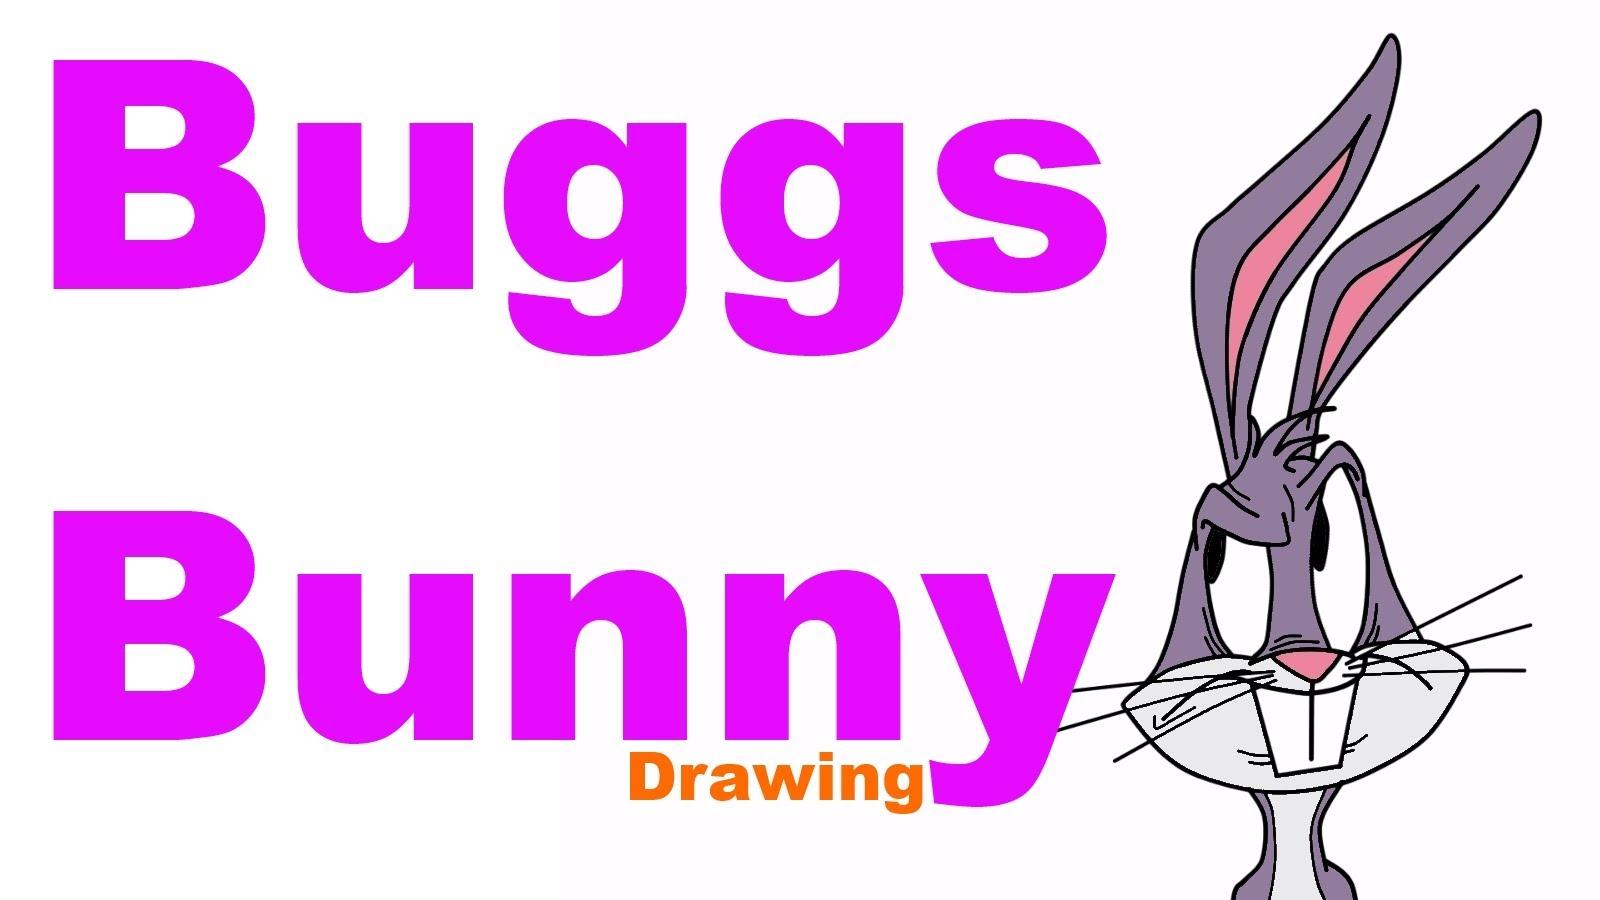 1600x900 Buggs Bunny Drawing